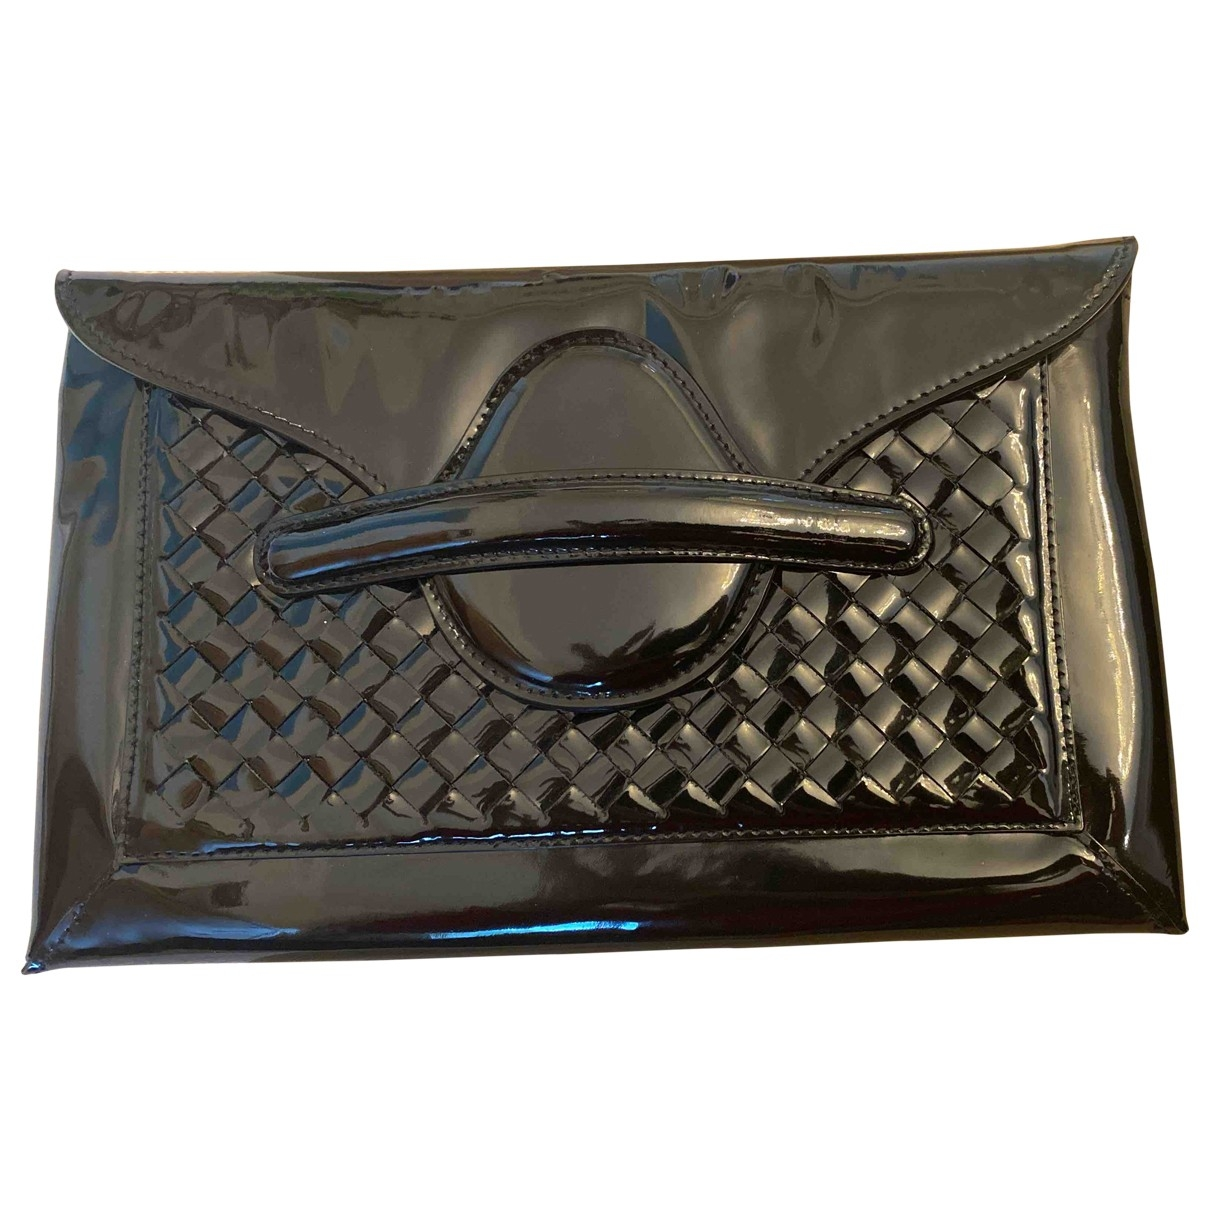 Bottega Veneta \N Black Patent leather Clutch bag for Women \N